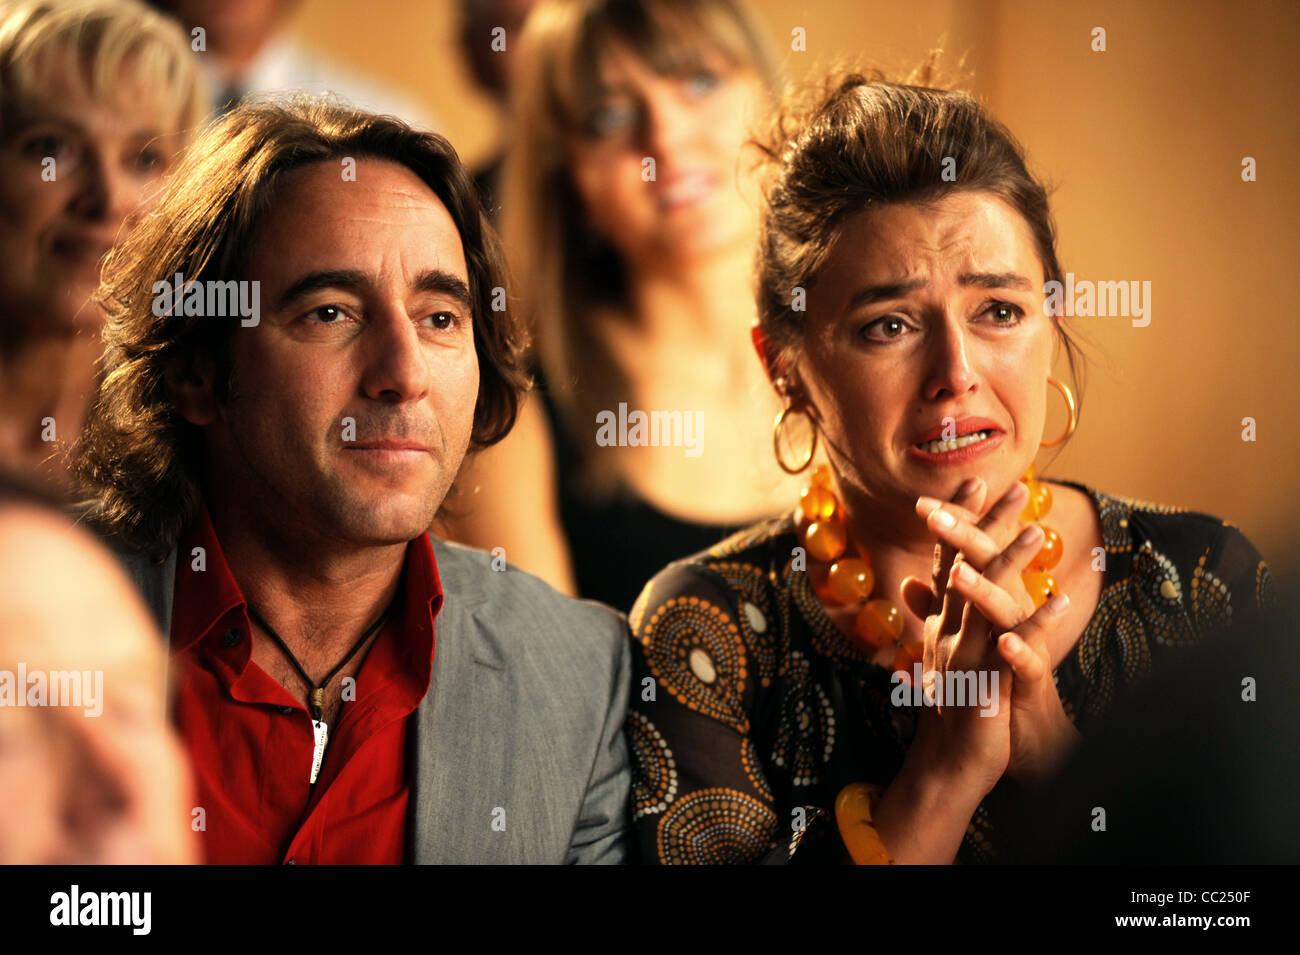 DIETER LANDURIS & ELISABETH ROMANO ROCK IT! (2010) - Stock Image